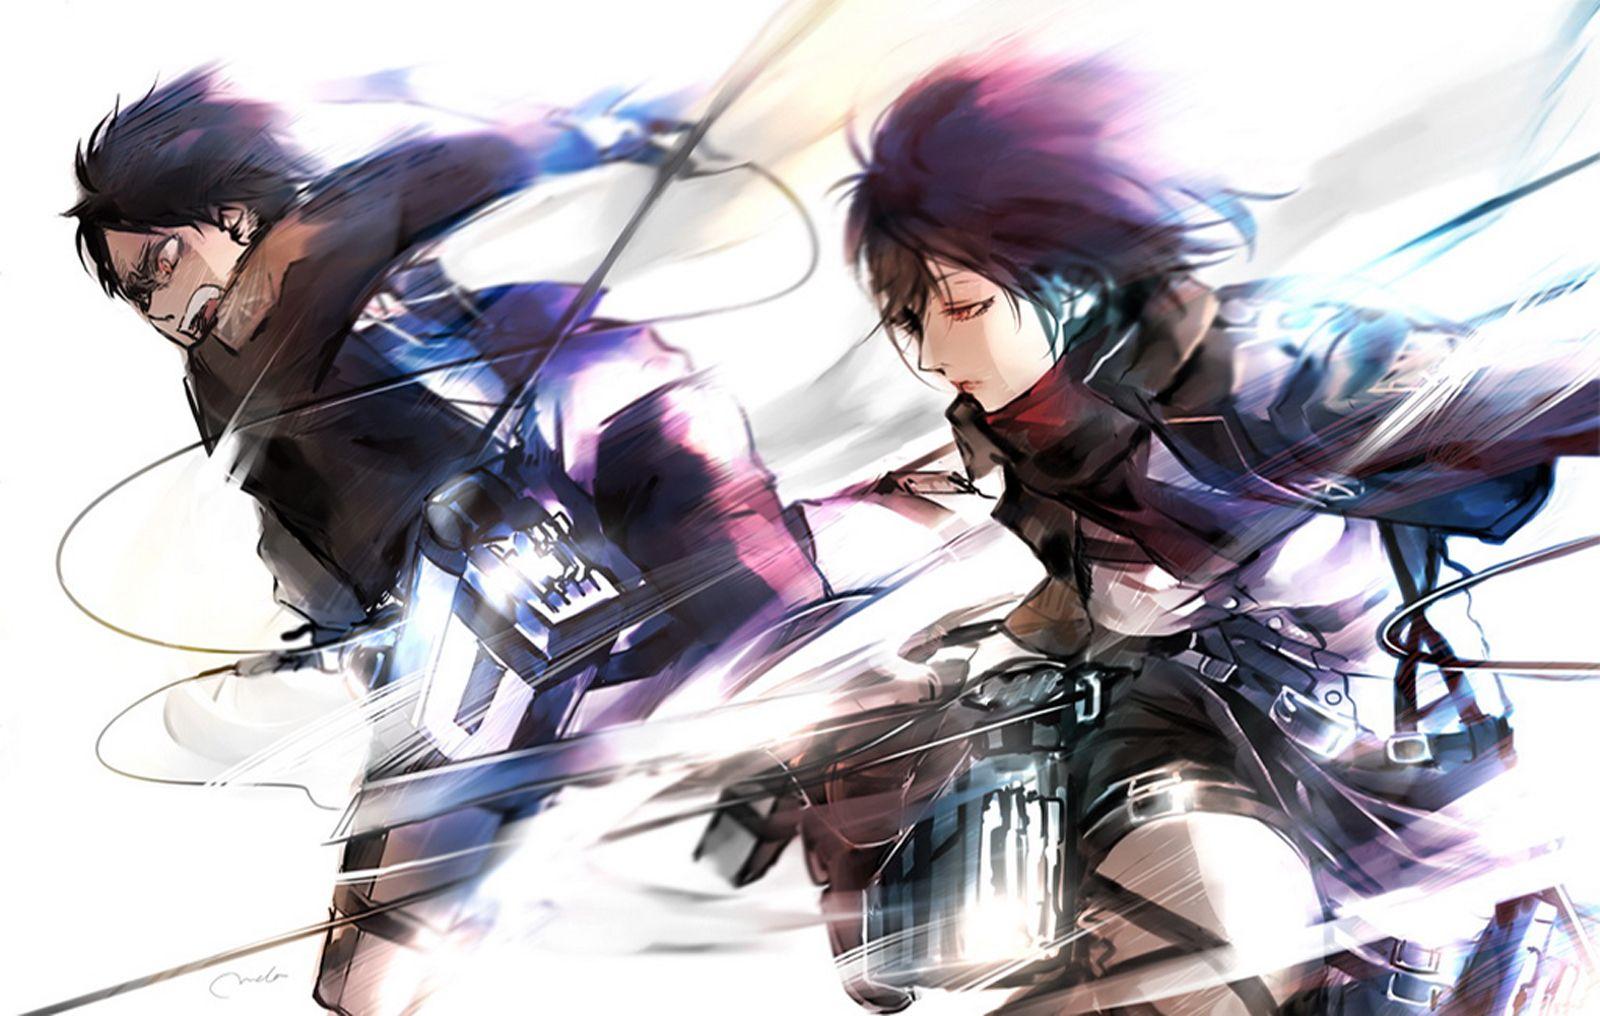 AOT Wallpapers Shingeki no Kyojin (Attack on titan